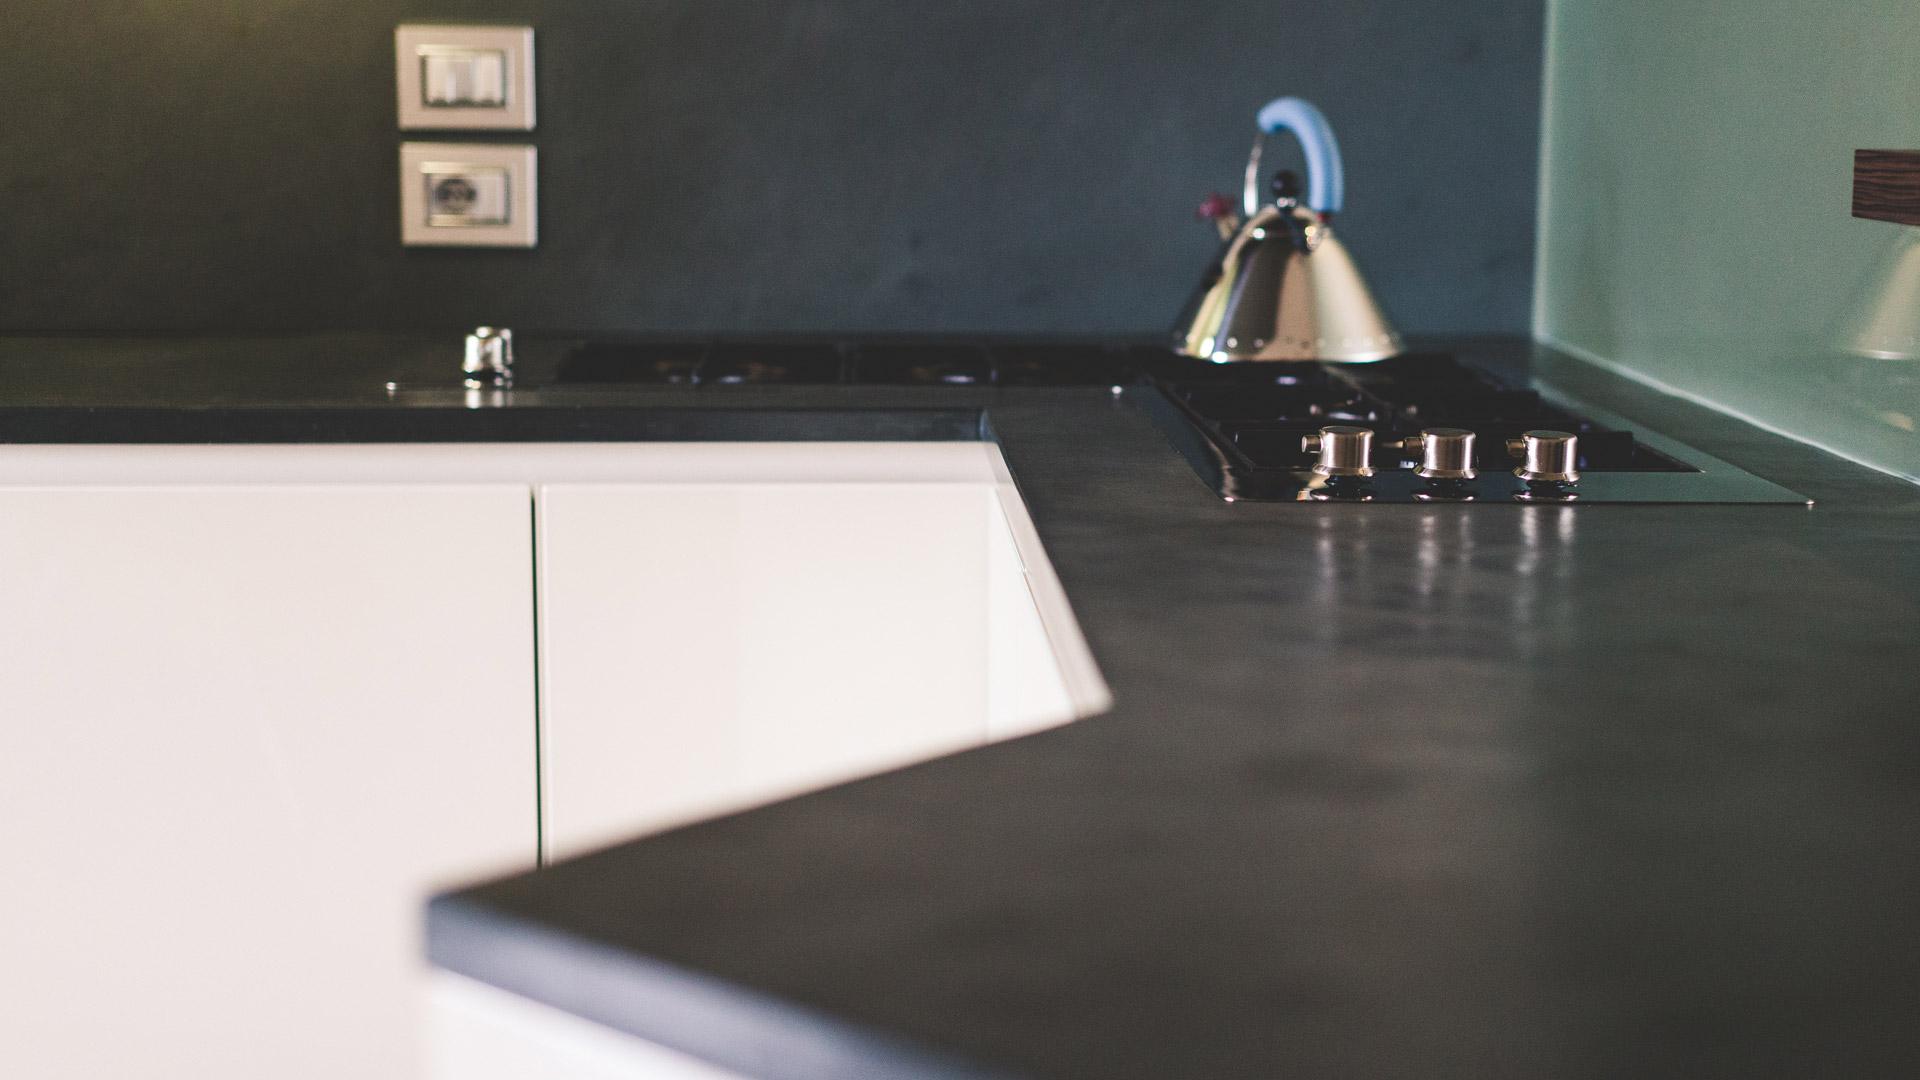 Top cucina quattro soluzioni per renderla unica